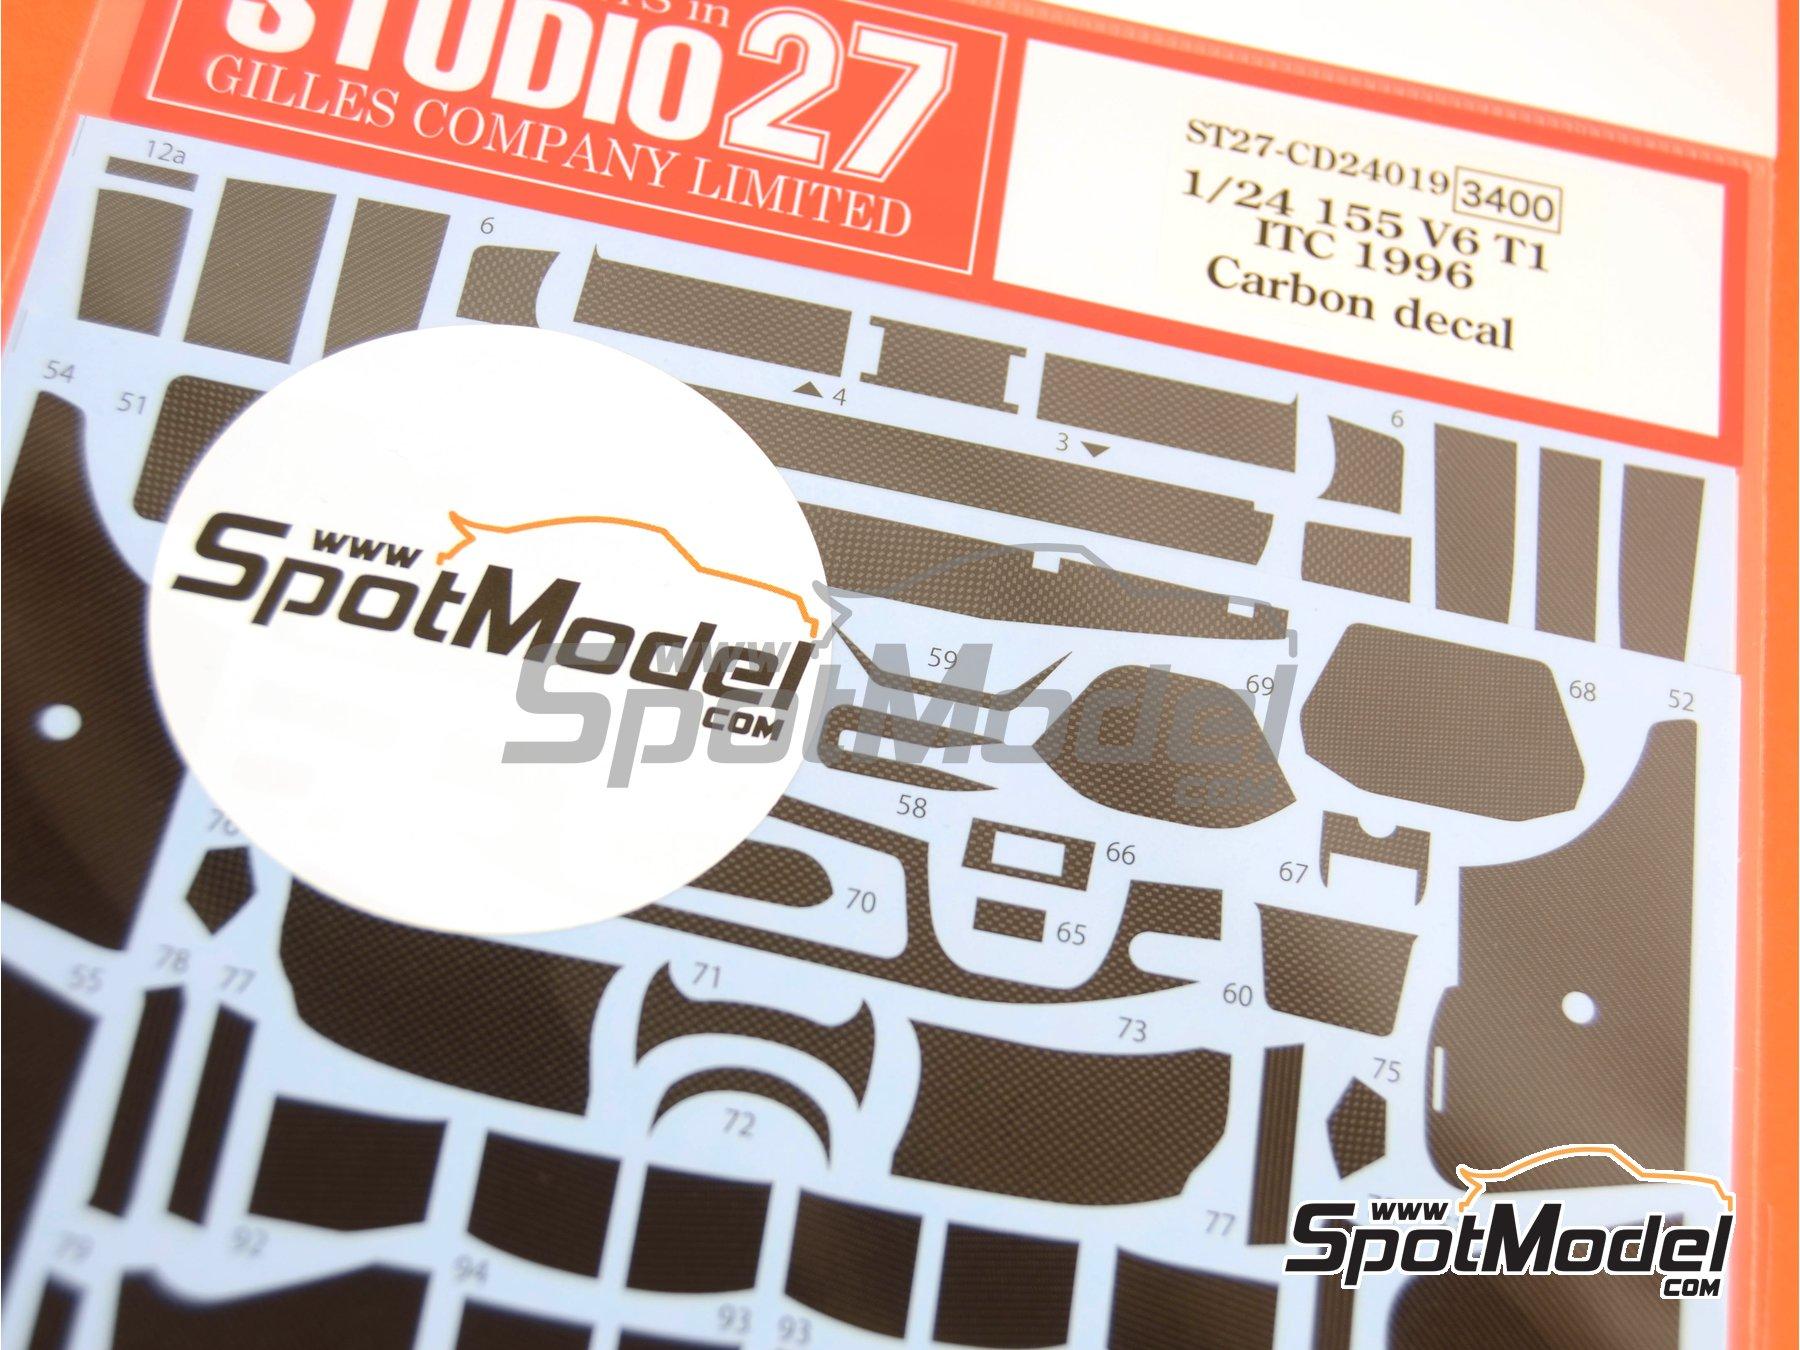 Image 1: Alfa Romeo 155 V6 TI - DTM 1996 | Patron de fibra de carbono en calca en escala1/24 fabricado por Studio27 (ref.ST27-CD24019)